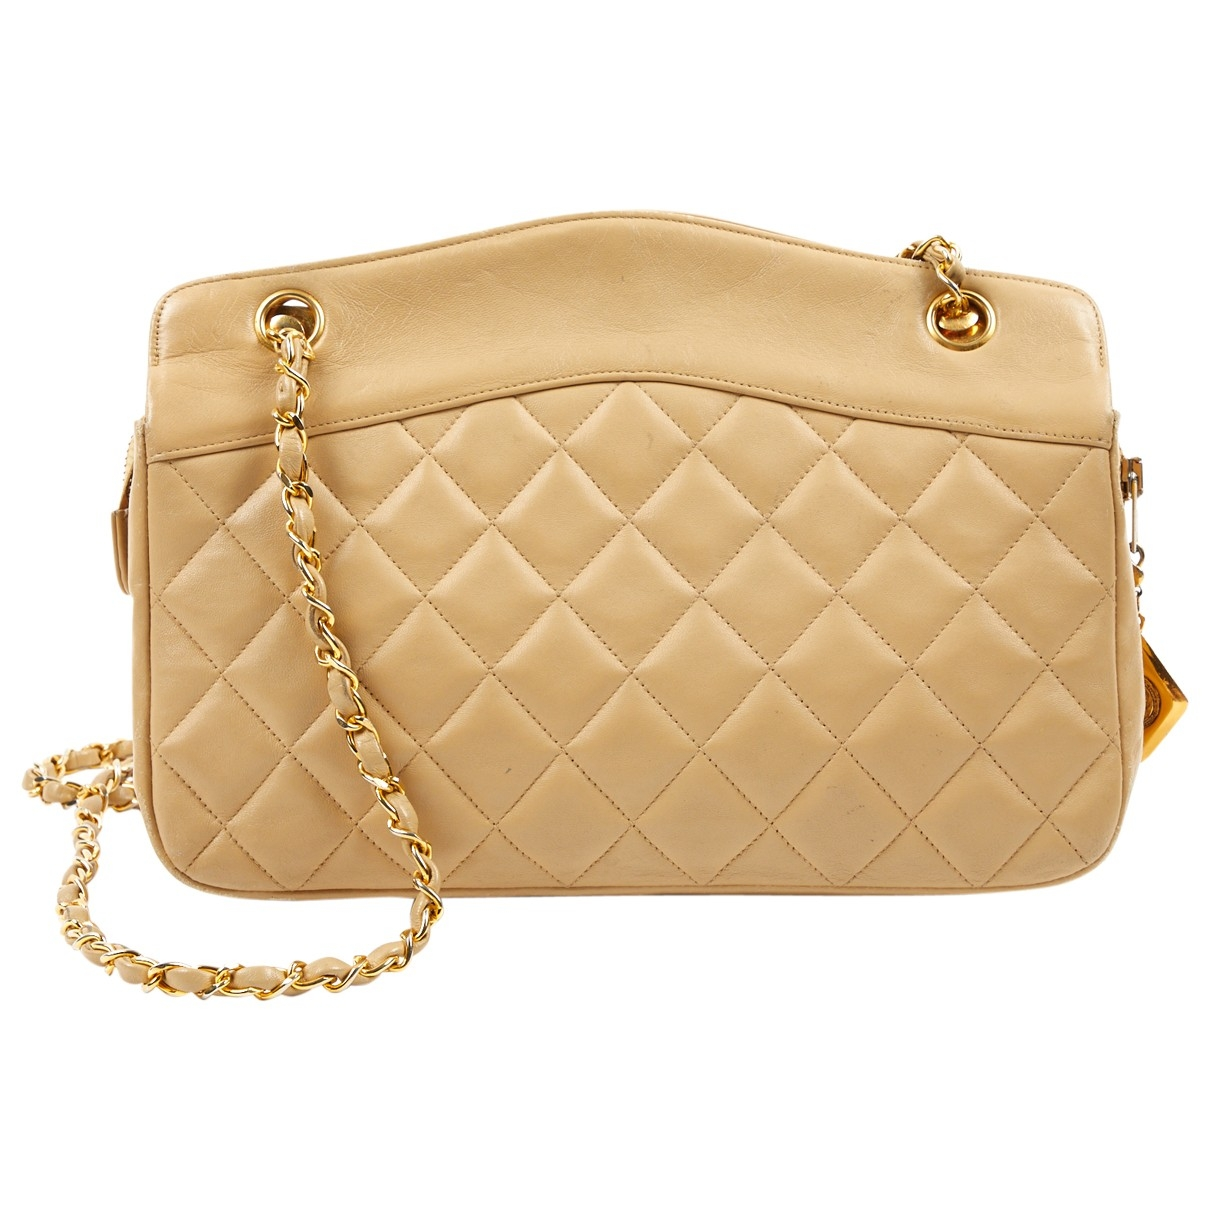 Chanel N Beige Leather handbag for Women N